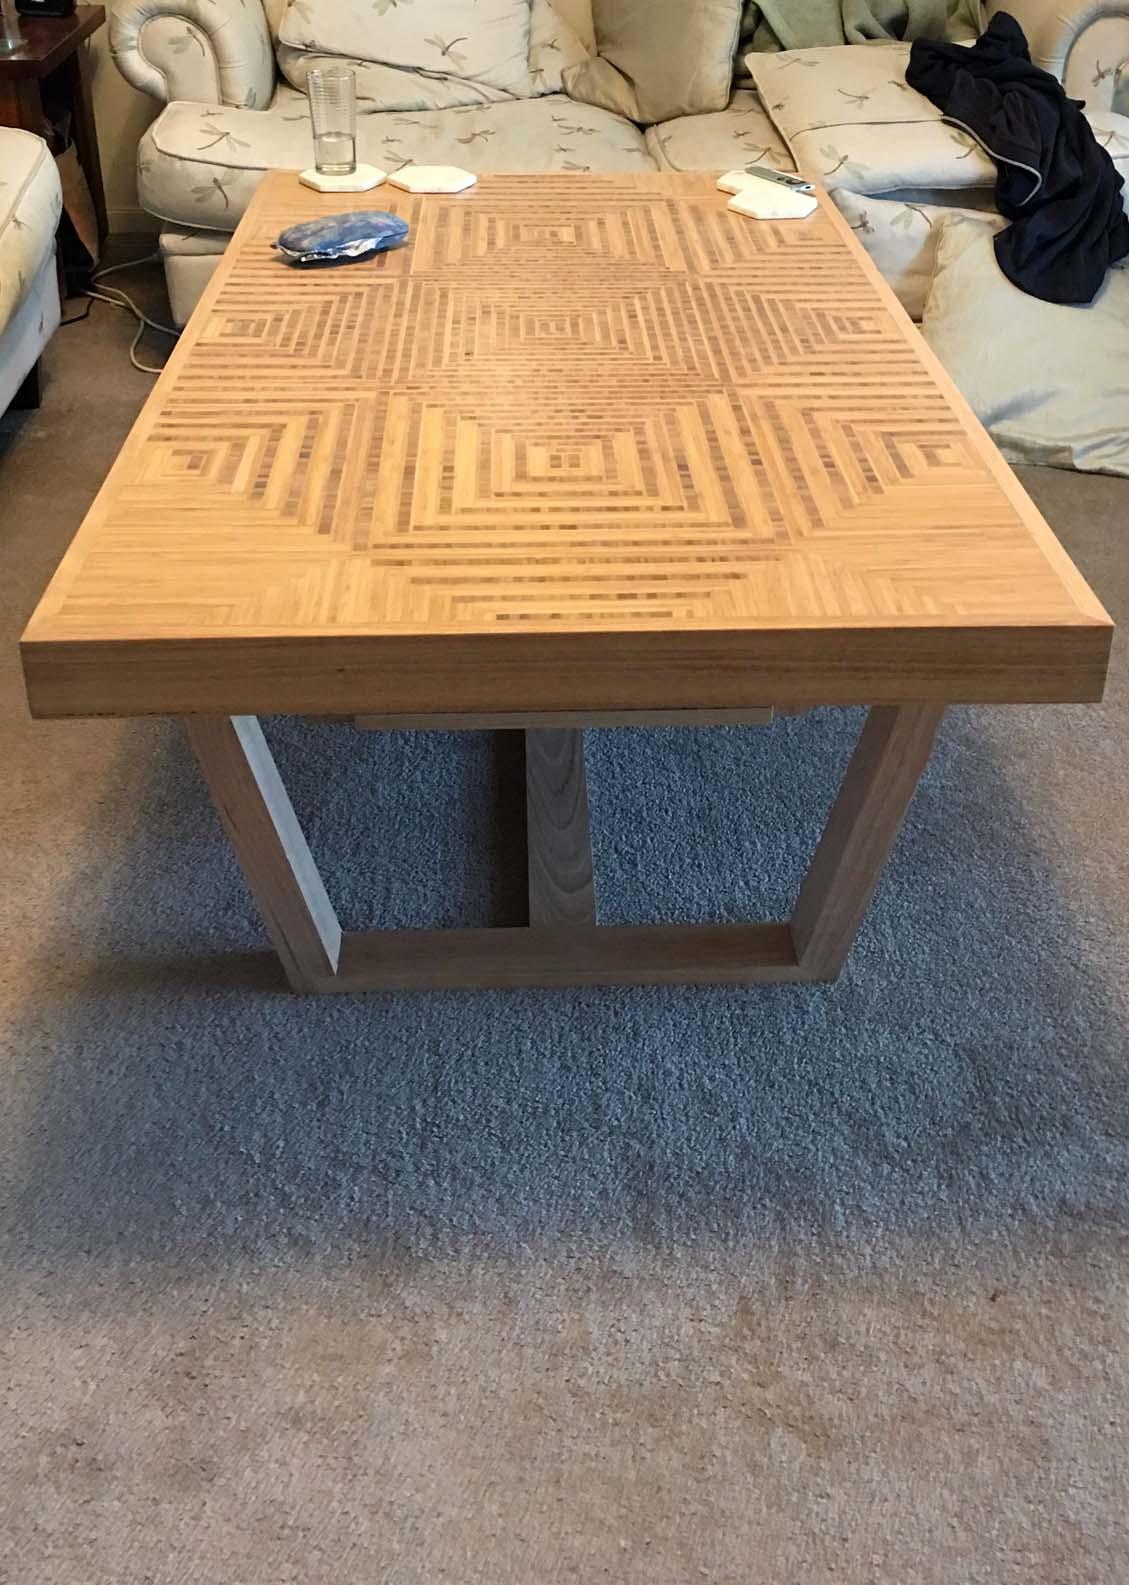 pattern table 1.jpg